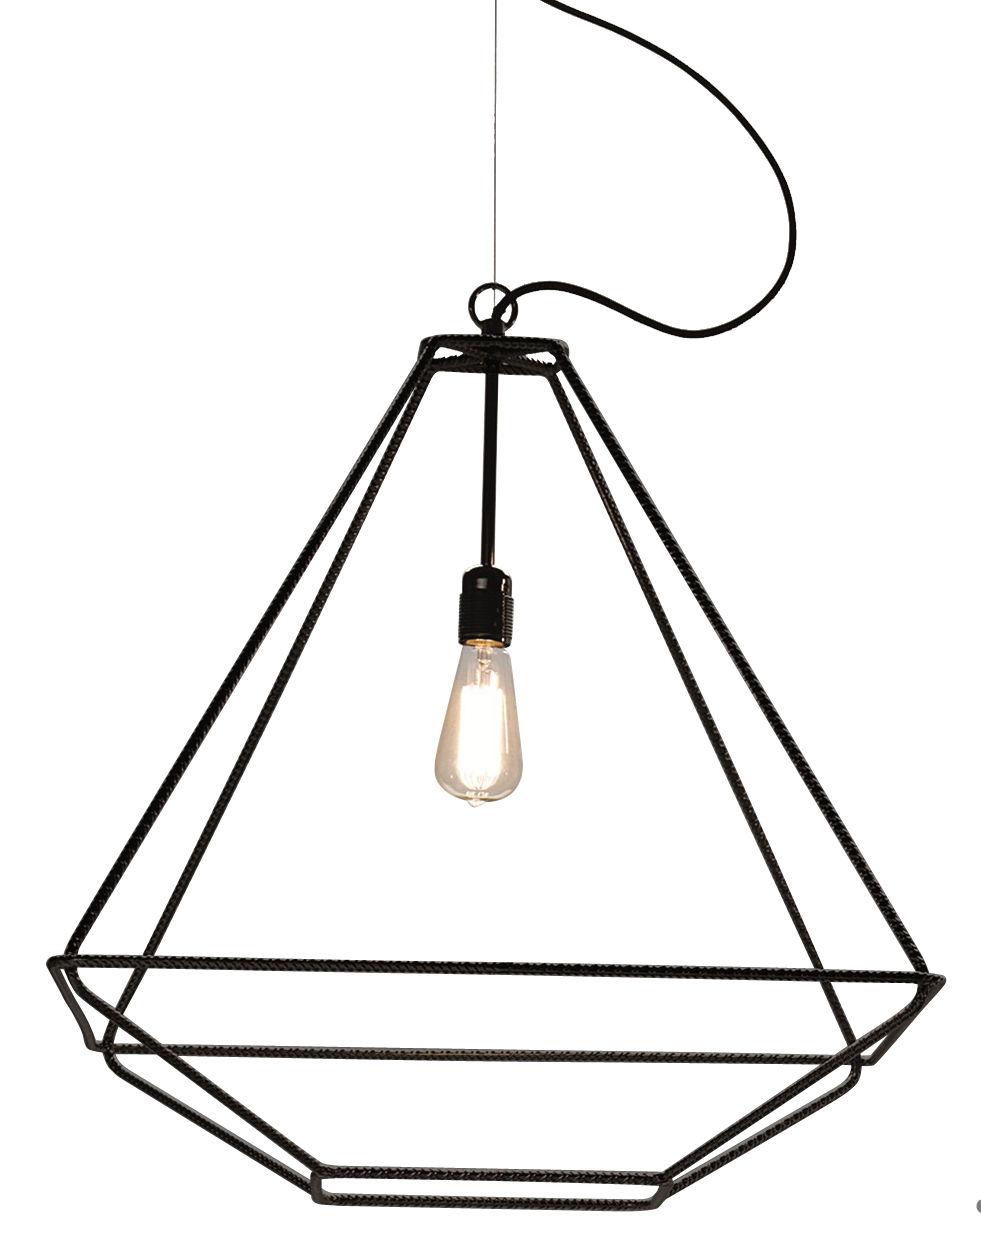 Lighting - Pendant Lighting - Con.Tradition Medium Pendant by Opinion Ciatti - Black - Metal